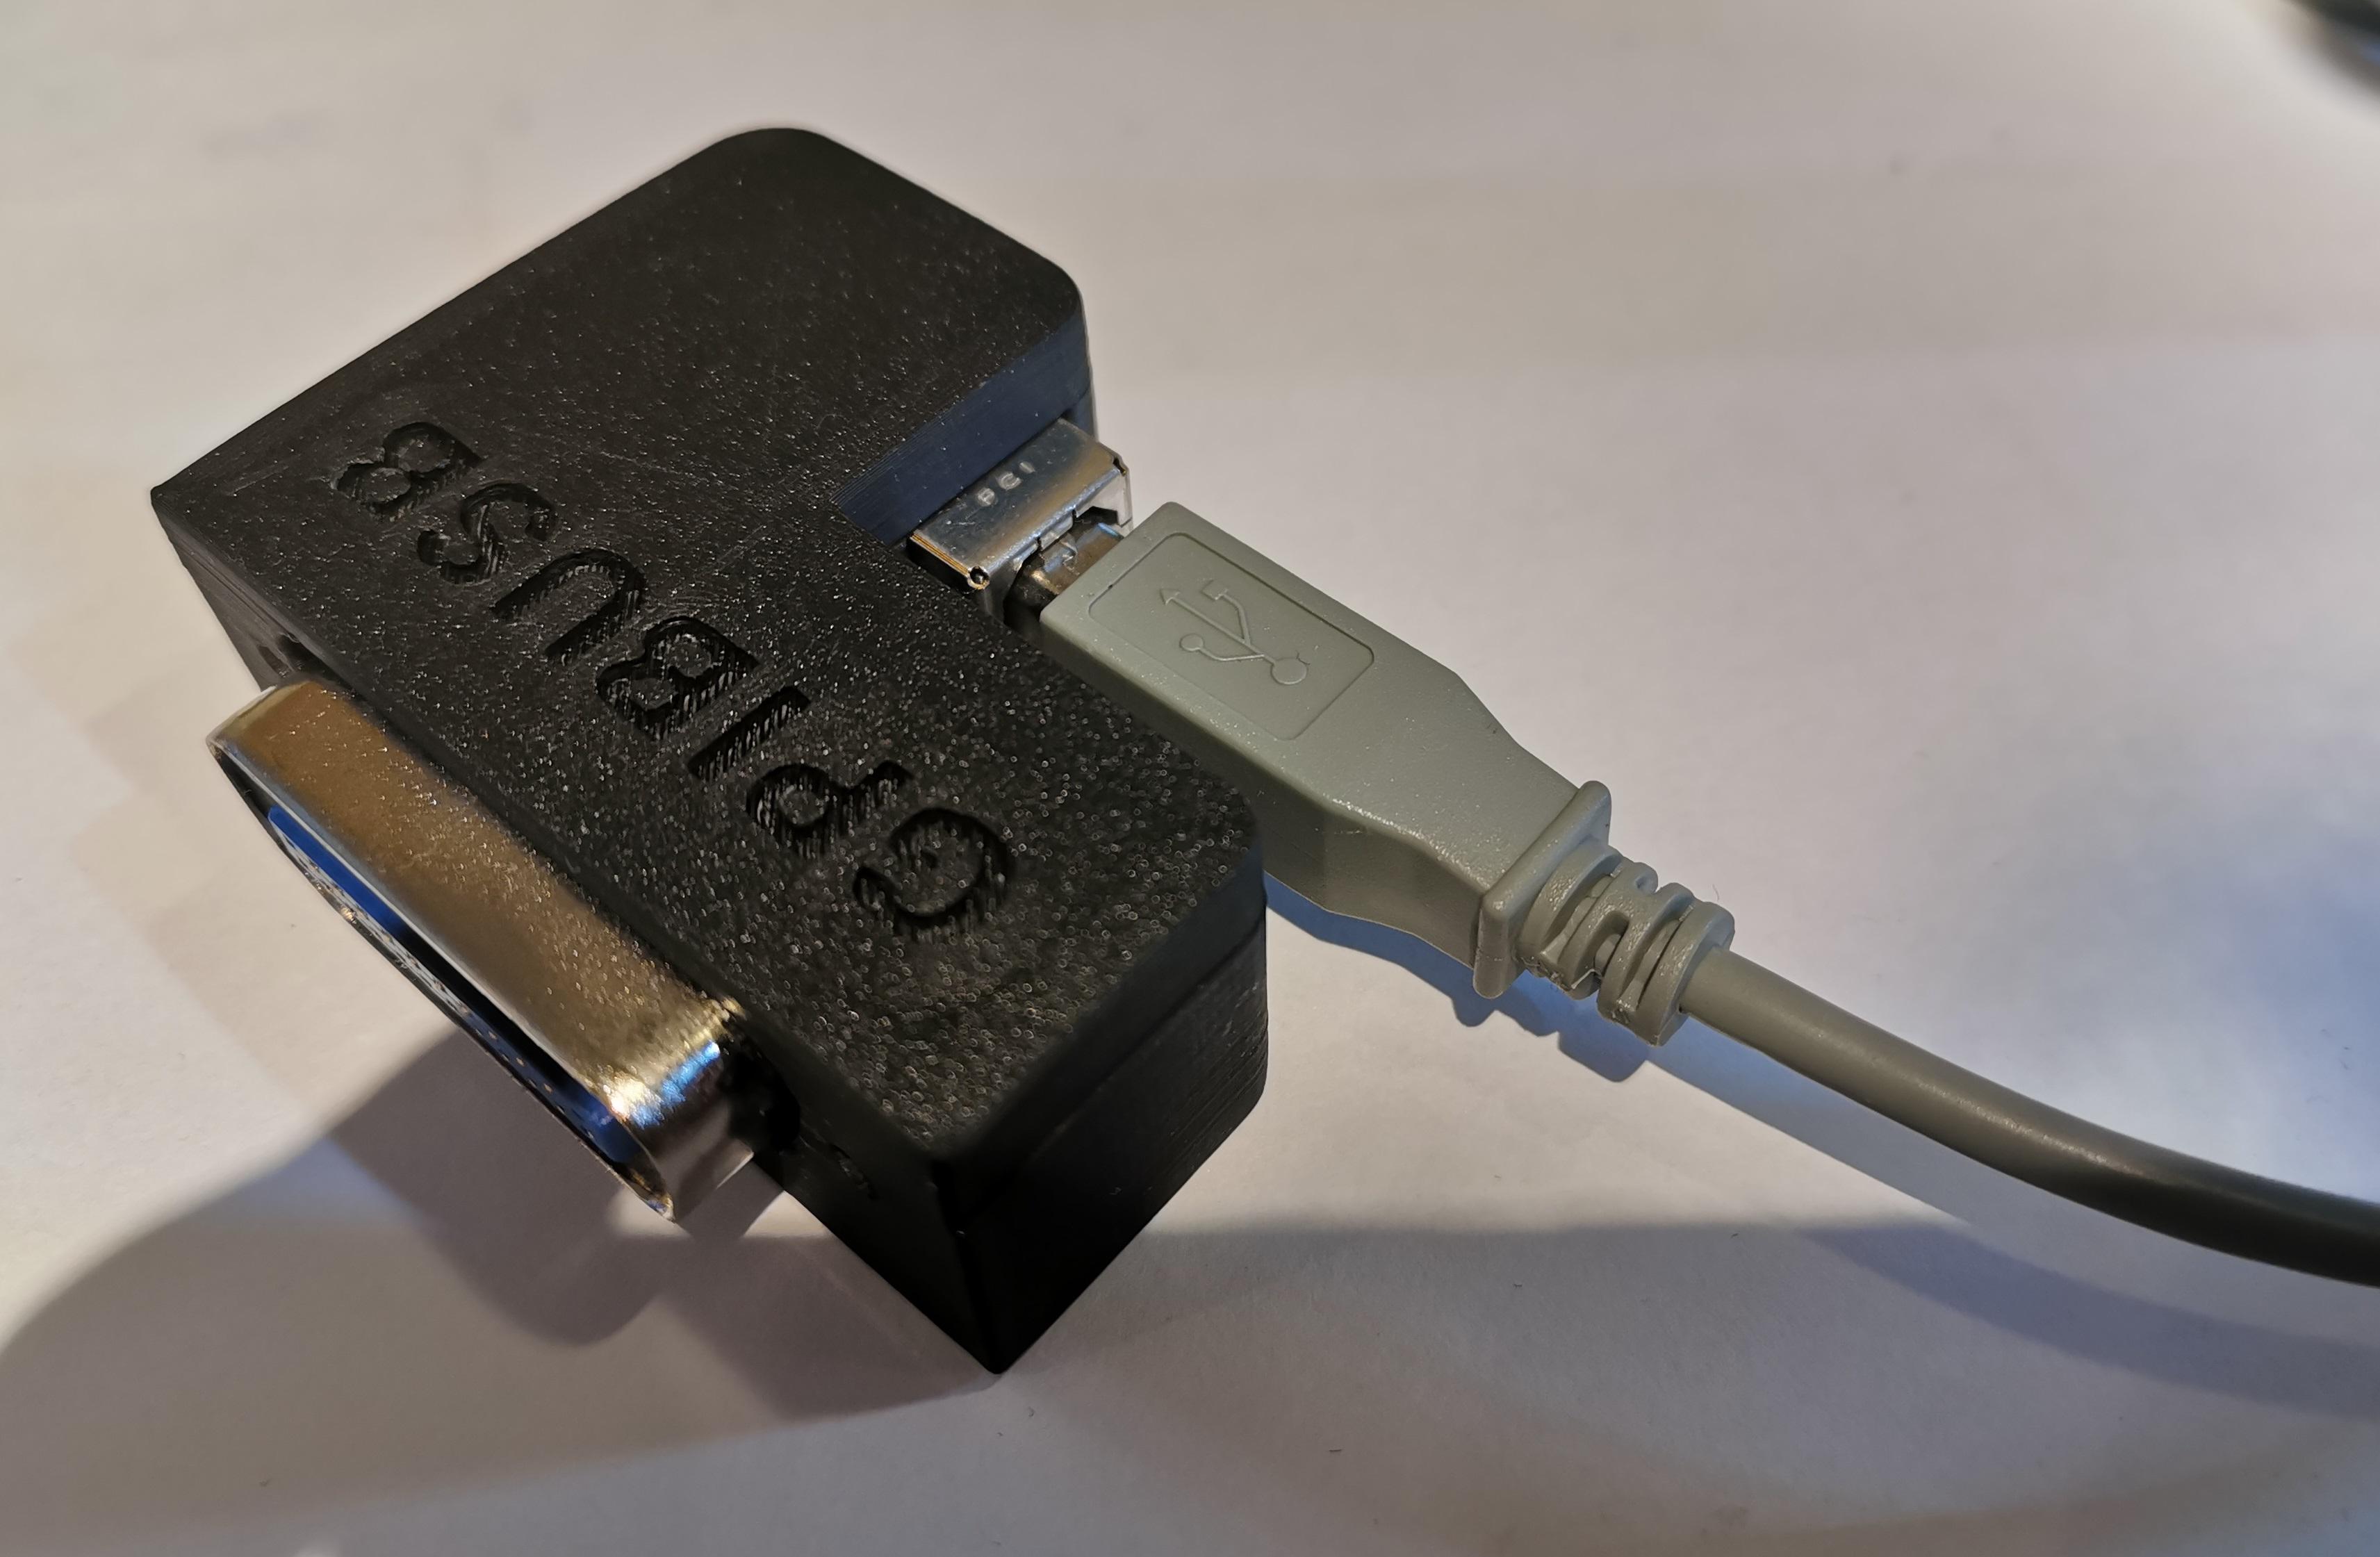 gpib cable wiring diagram github xyphro usbgpib versatile  cheap and portable usb to gpib  github xyphro usbgpib versatile